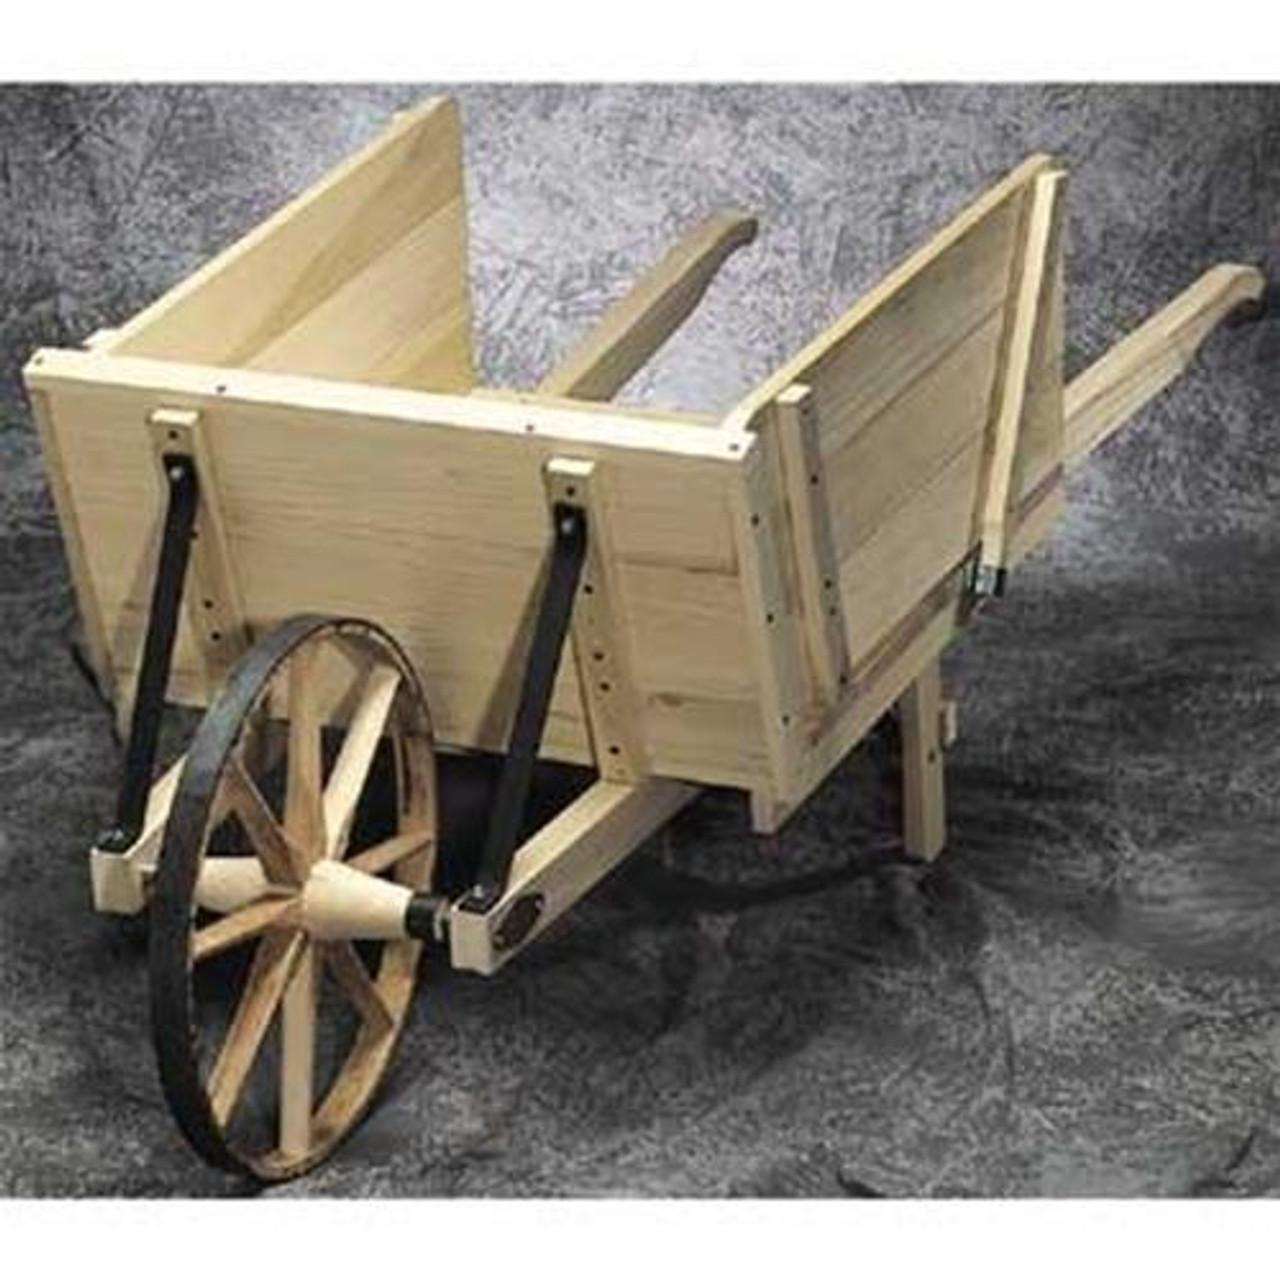 Cherry Tree Toys Garden Wheelbarrow Plan